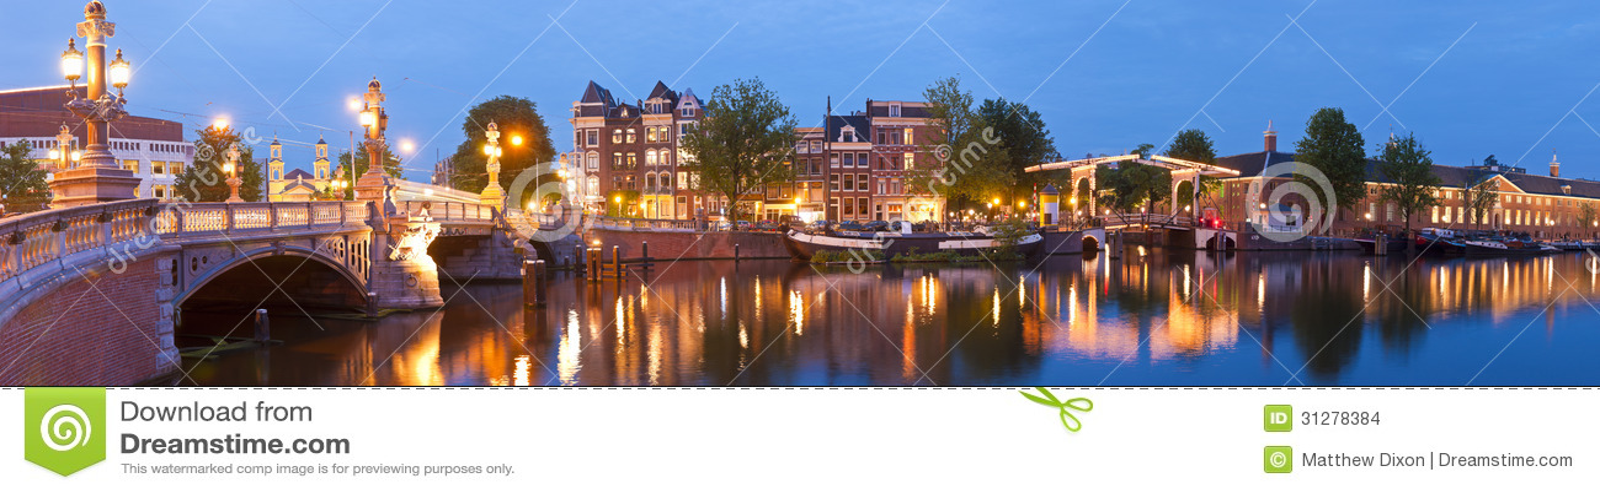 Blauwbrug, Άμστερνταμ